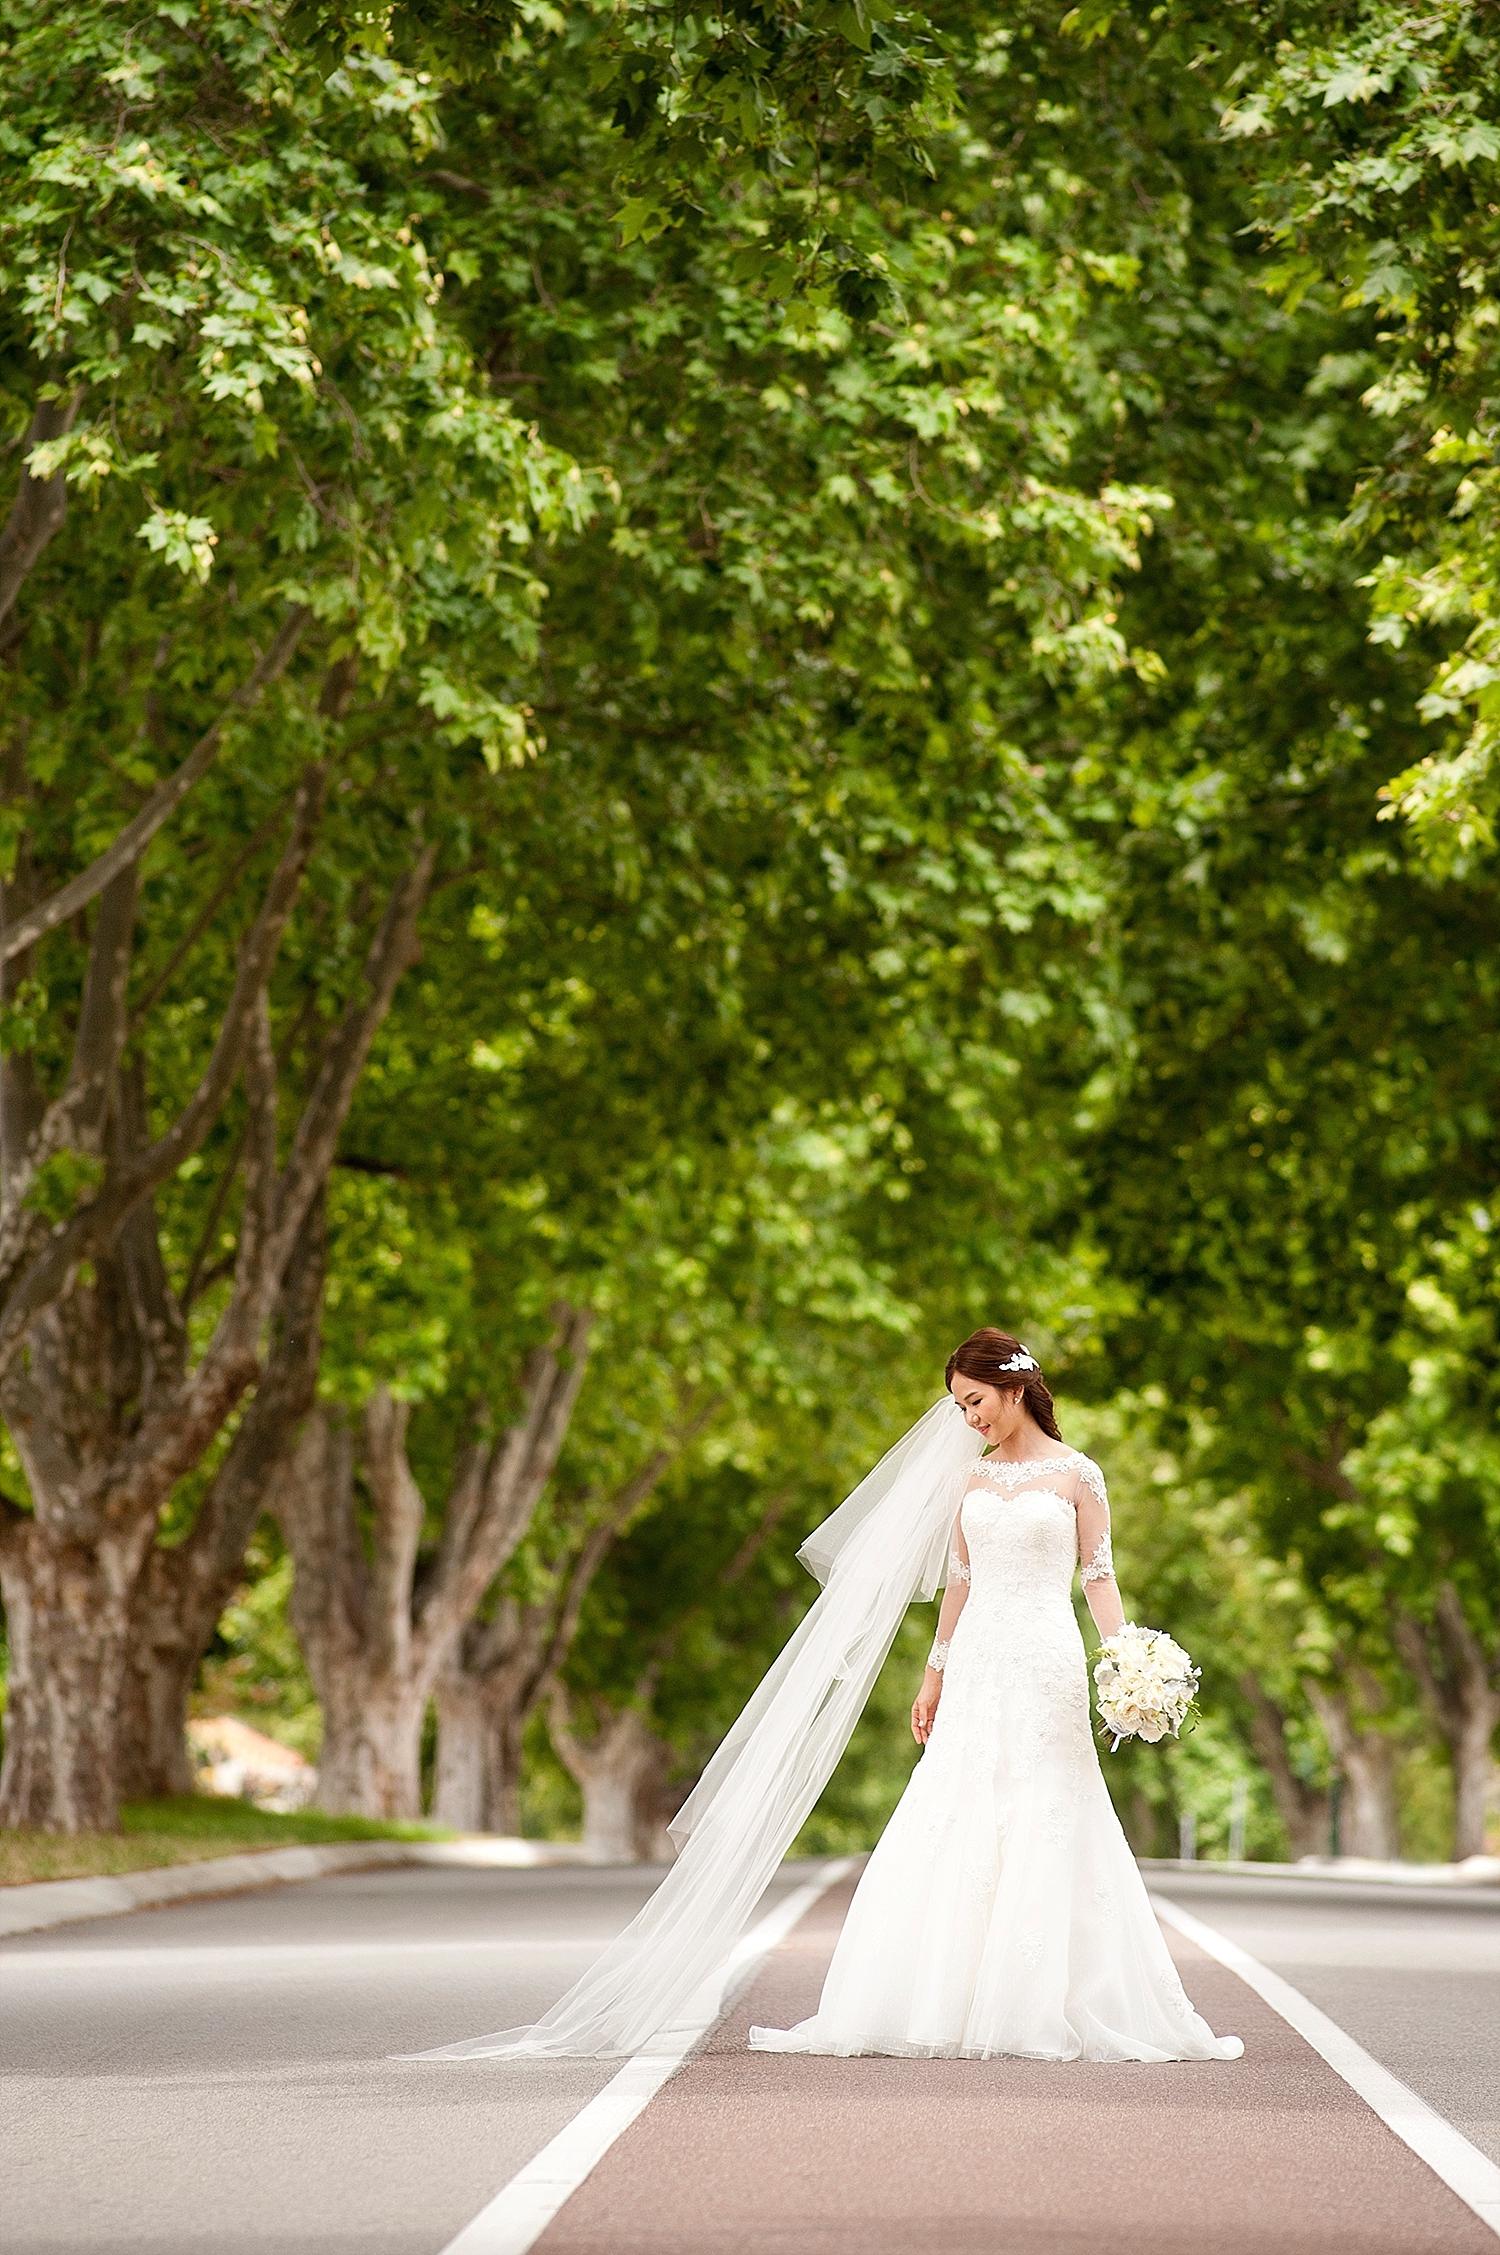 wedding photos in applecross london plane trees across road